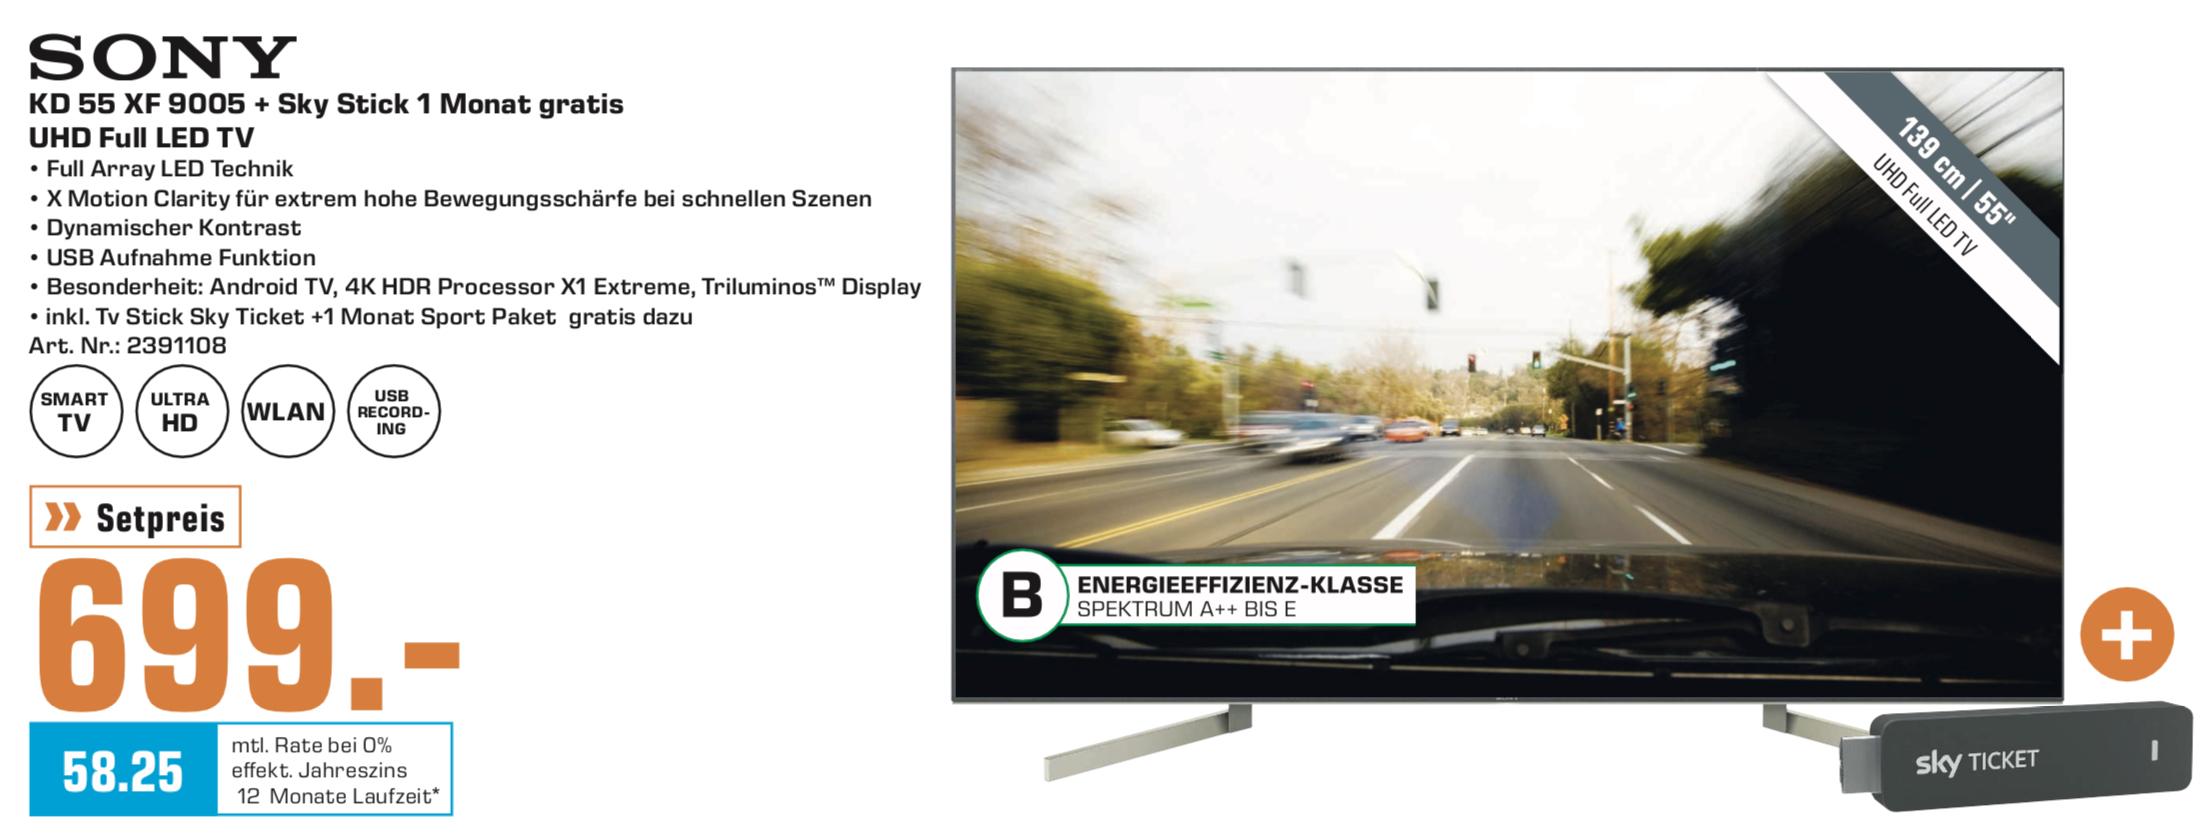 Lokal Saturn Bochum: Sony KD-55XF9005 139cm 4K UHD TV FALD für 699€ inkl. Sky-Stick + 1 Monat gratis Sport-Paket